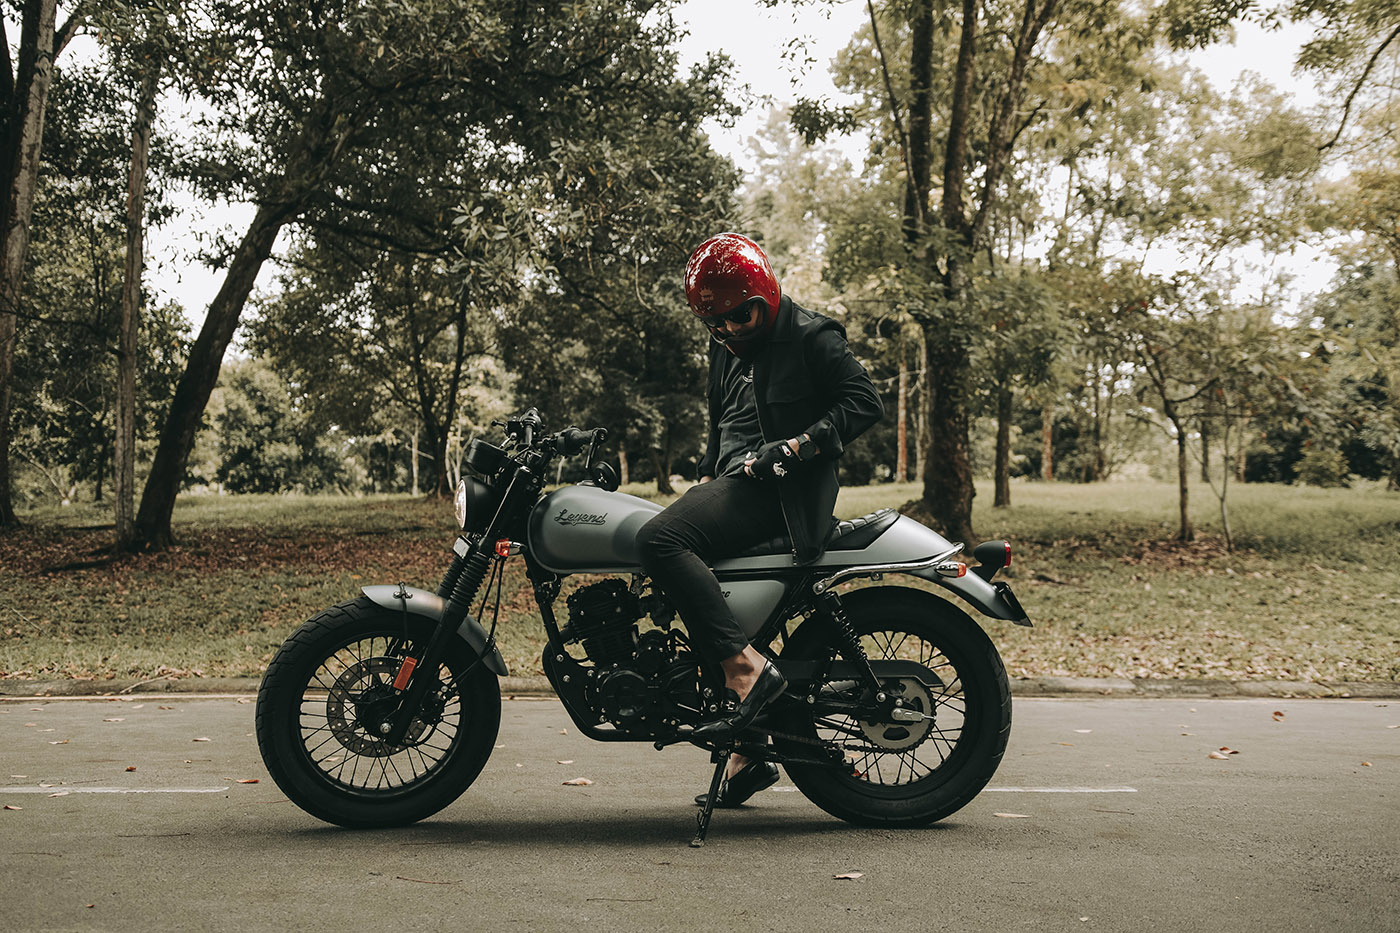 motor custom gpx legend 150 malaysia